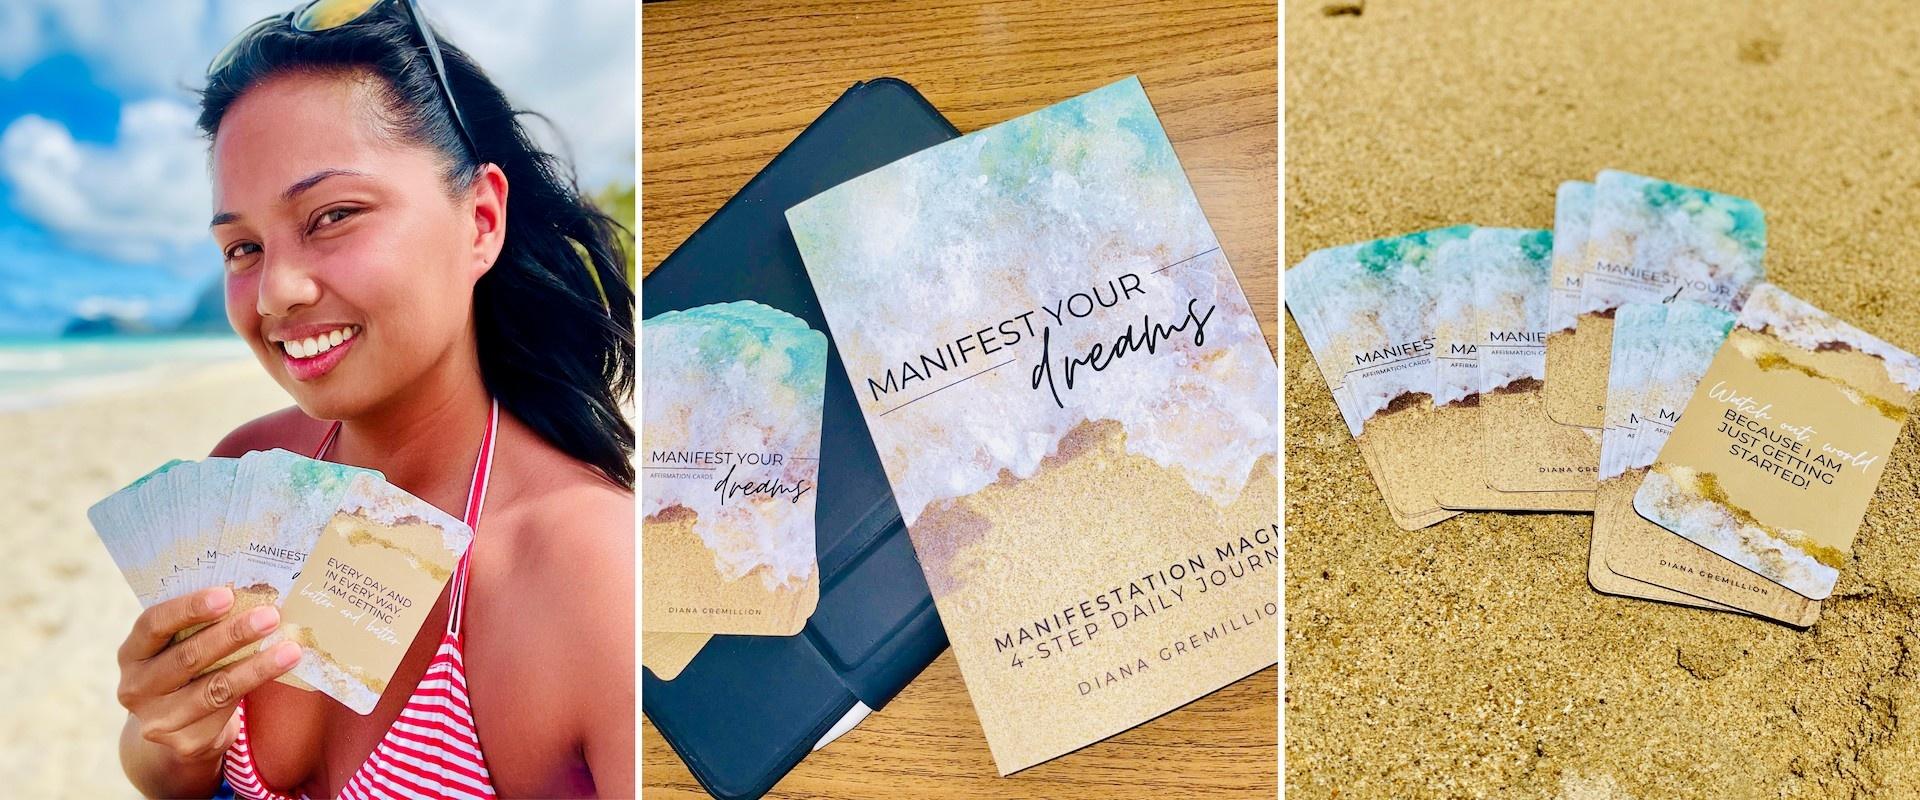 Manifest Your Dreams Affirmation Cards and Journal Bundle